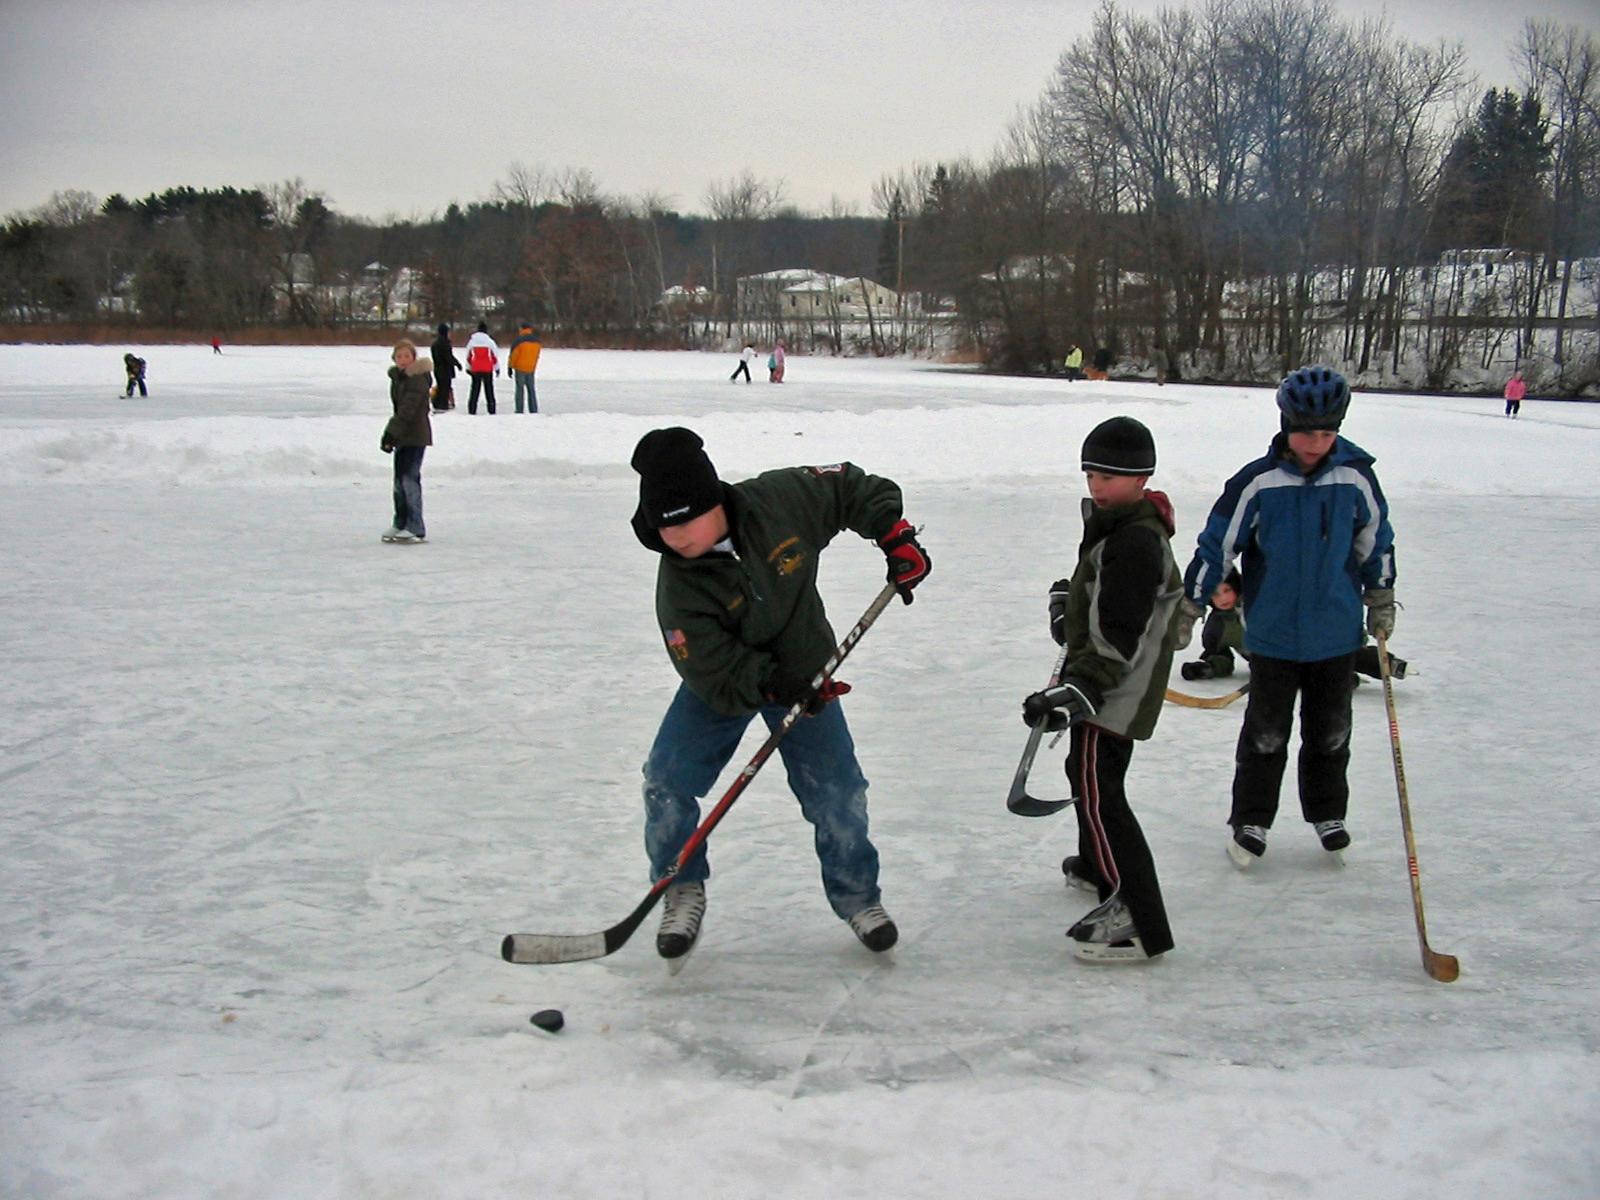 Ice Skating Kids | www.imgkid.com - The Image Kid Has It!